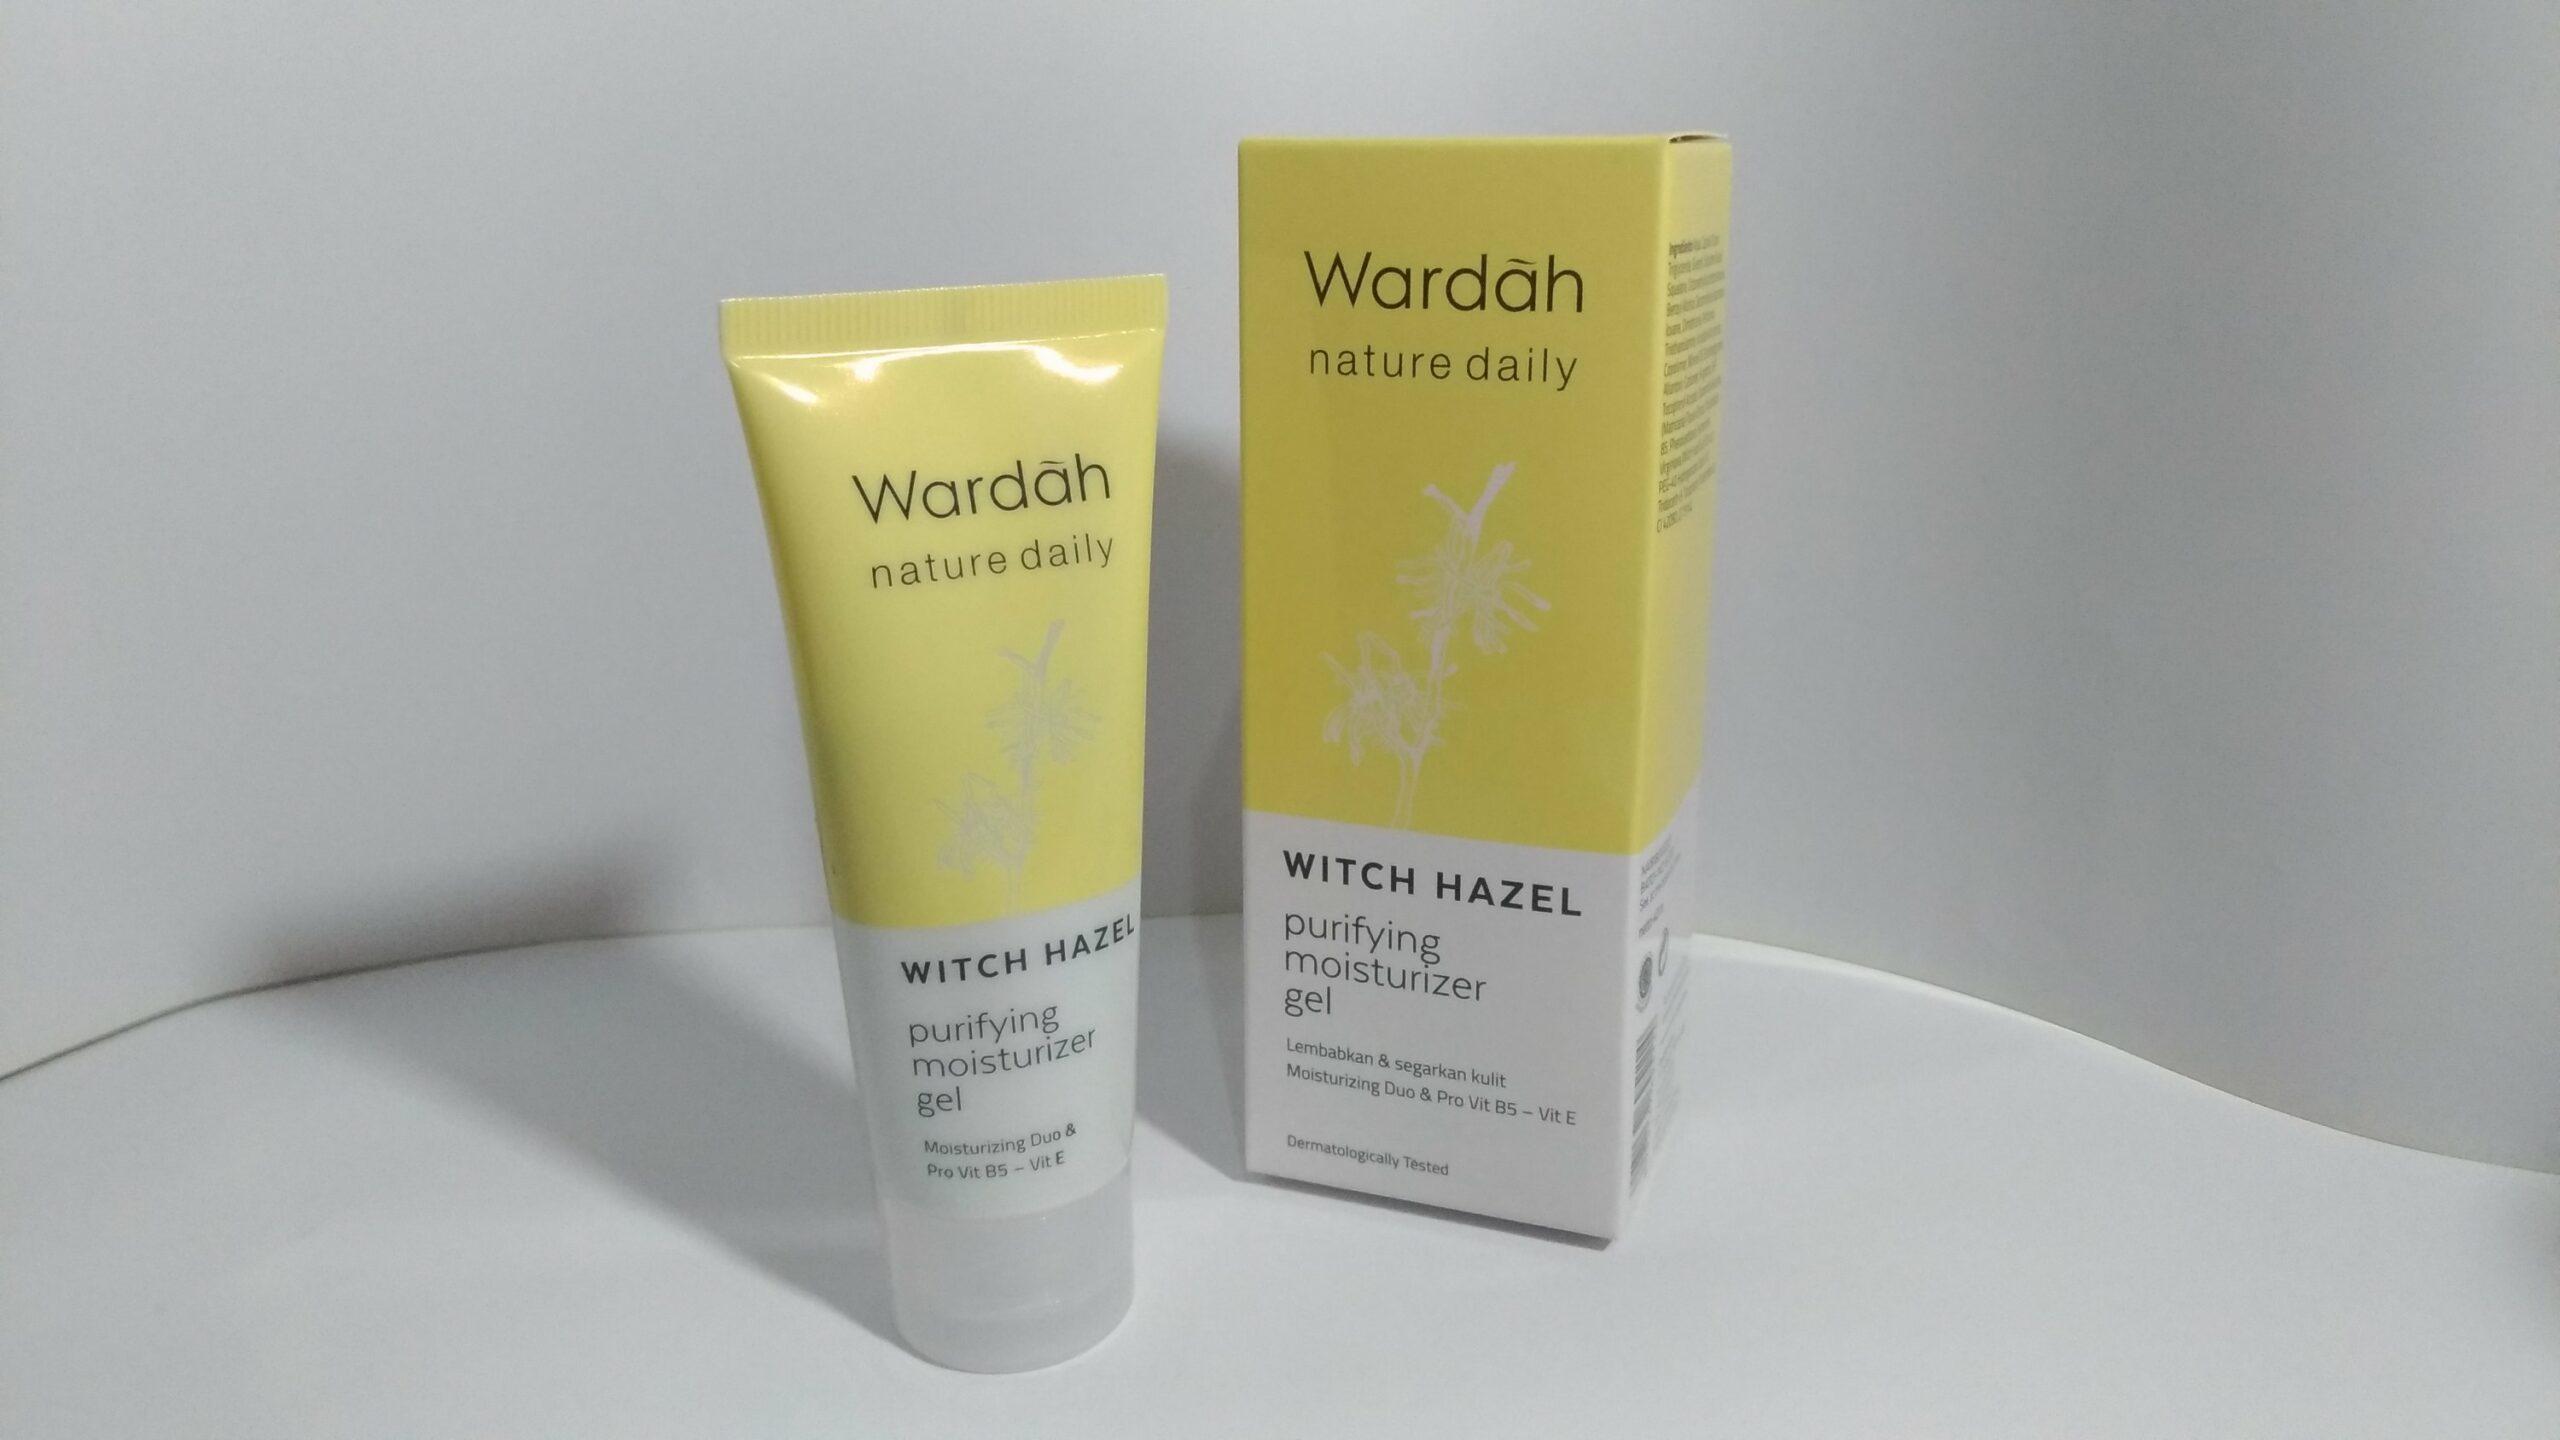 Wardah-Purifying-Moisturizer-Gel